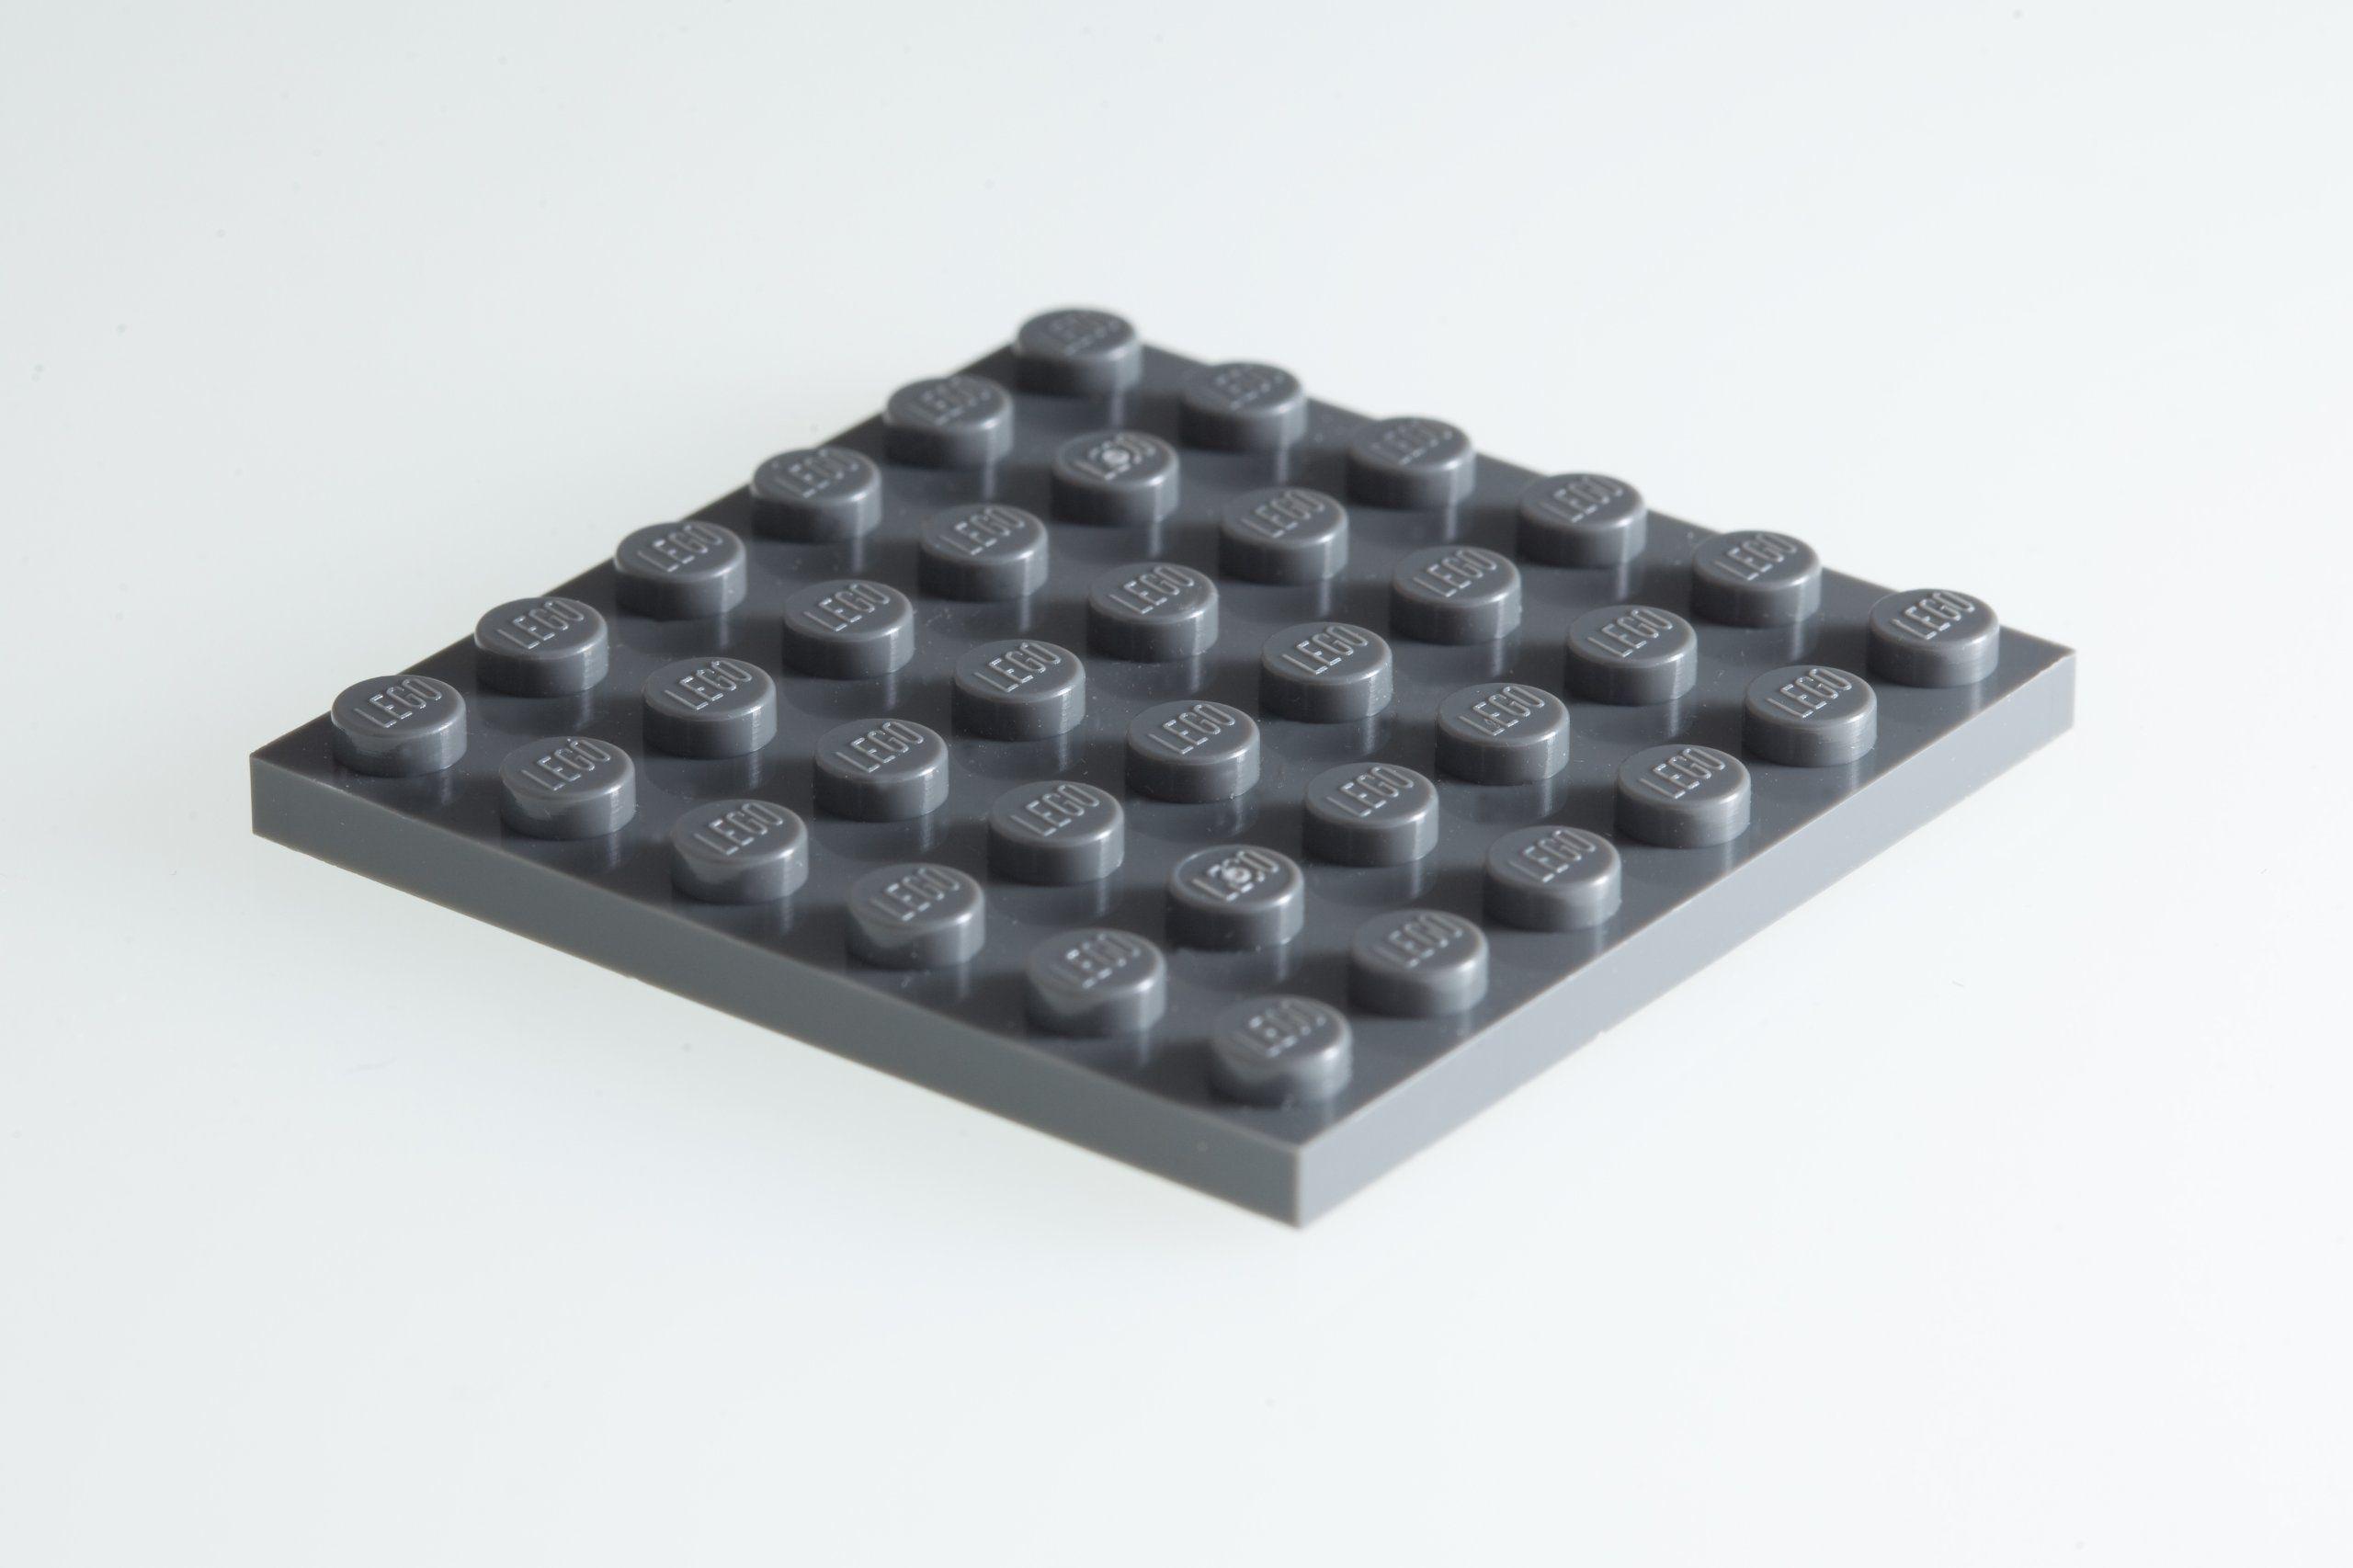 PLATES 1 x 1 NEW LEGO Green Dark plate x 50-1x1